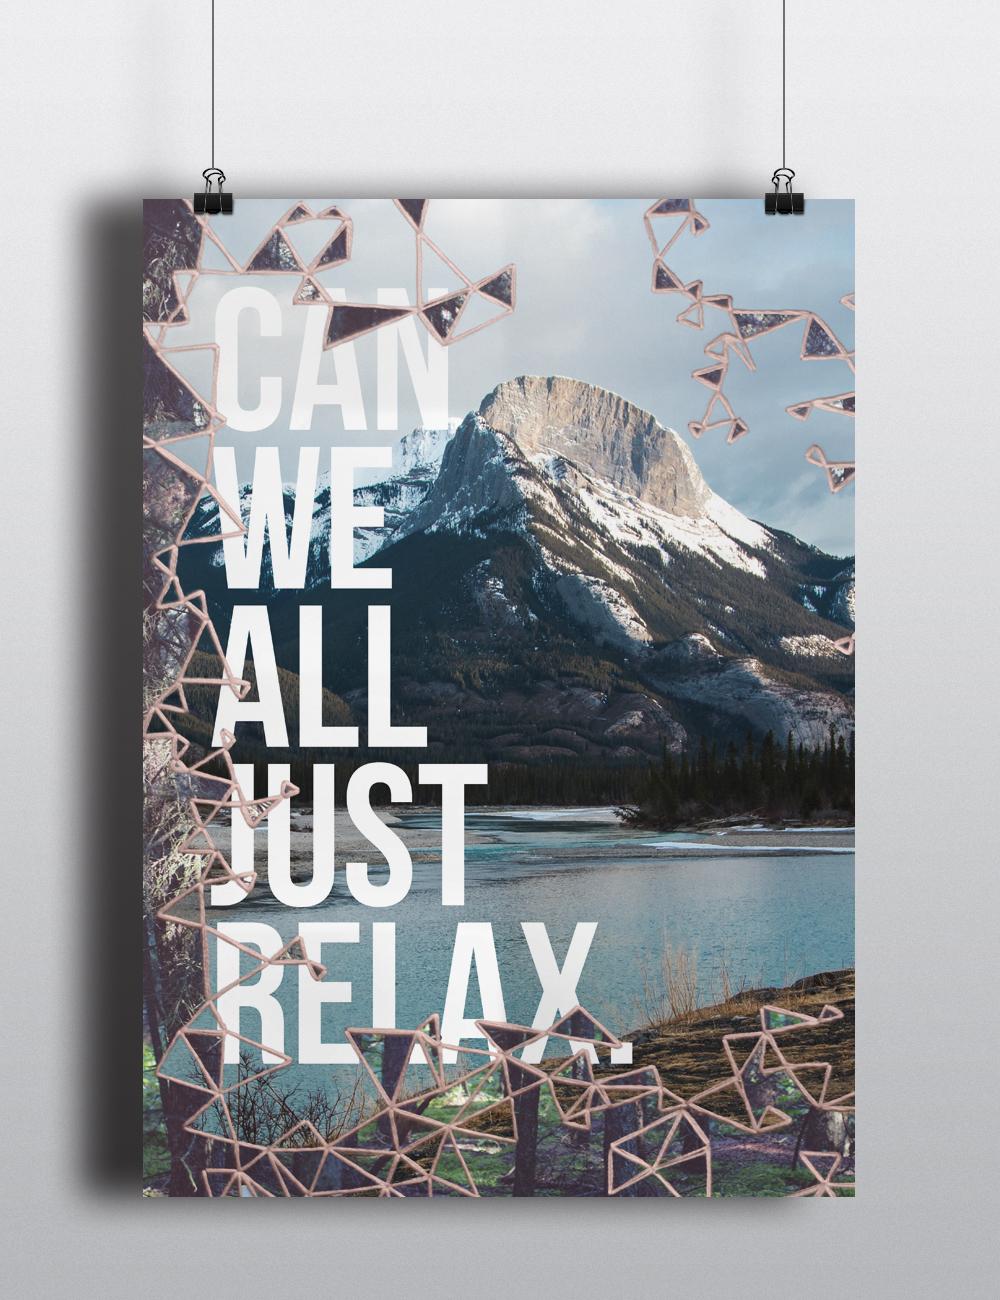 relax ? megan steinwand design & photography - Steinwand Design